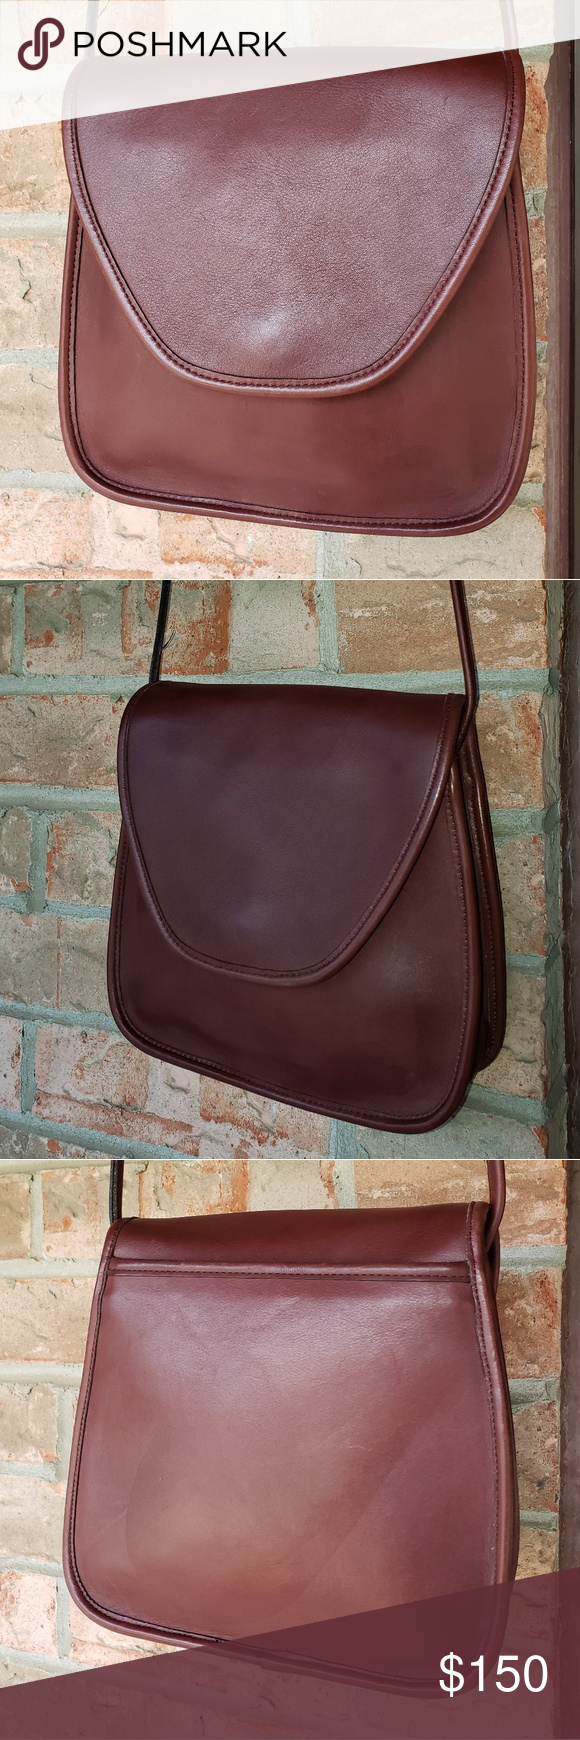 Spotted while shopping on Poshmark  Vintage coach bag.!  poshmark  fashion   shopping  style  Coach  Handbags 3afaf15a02